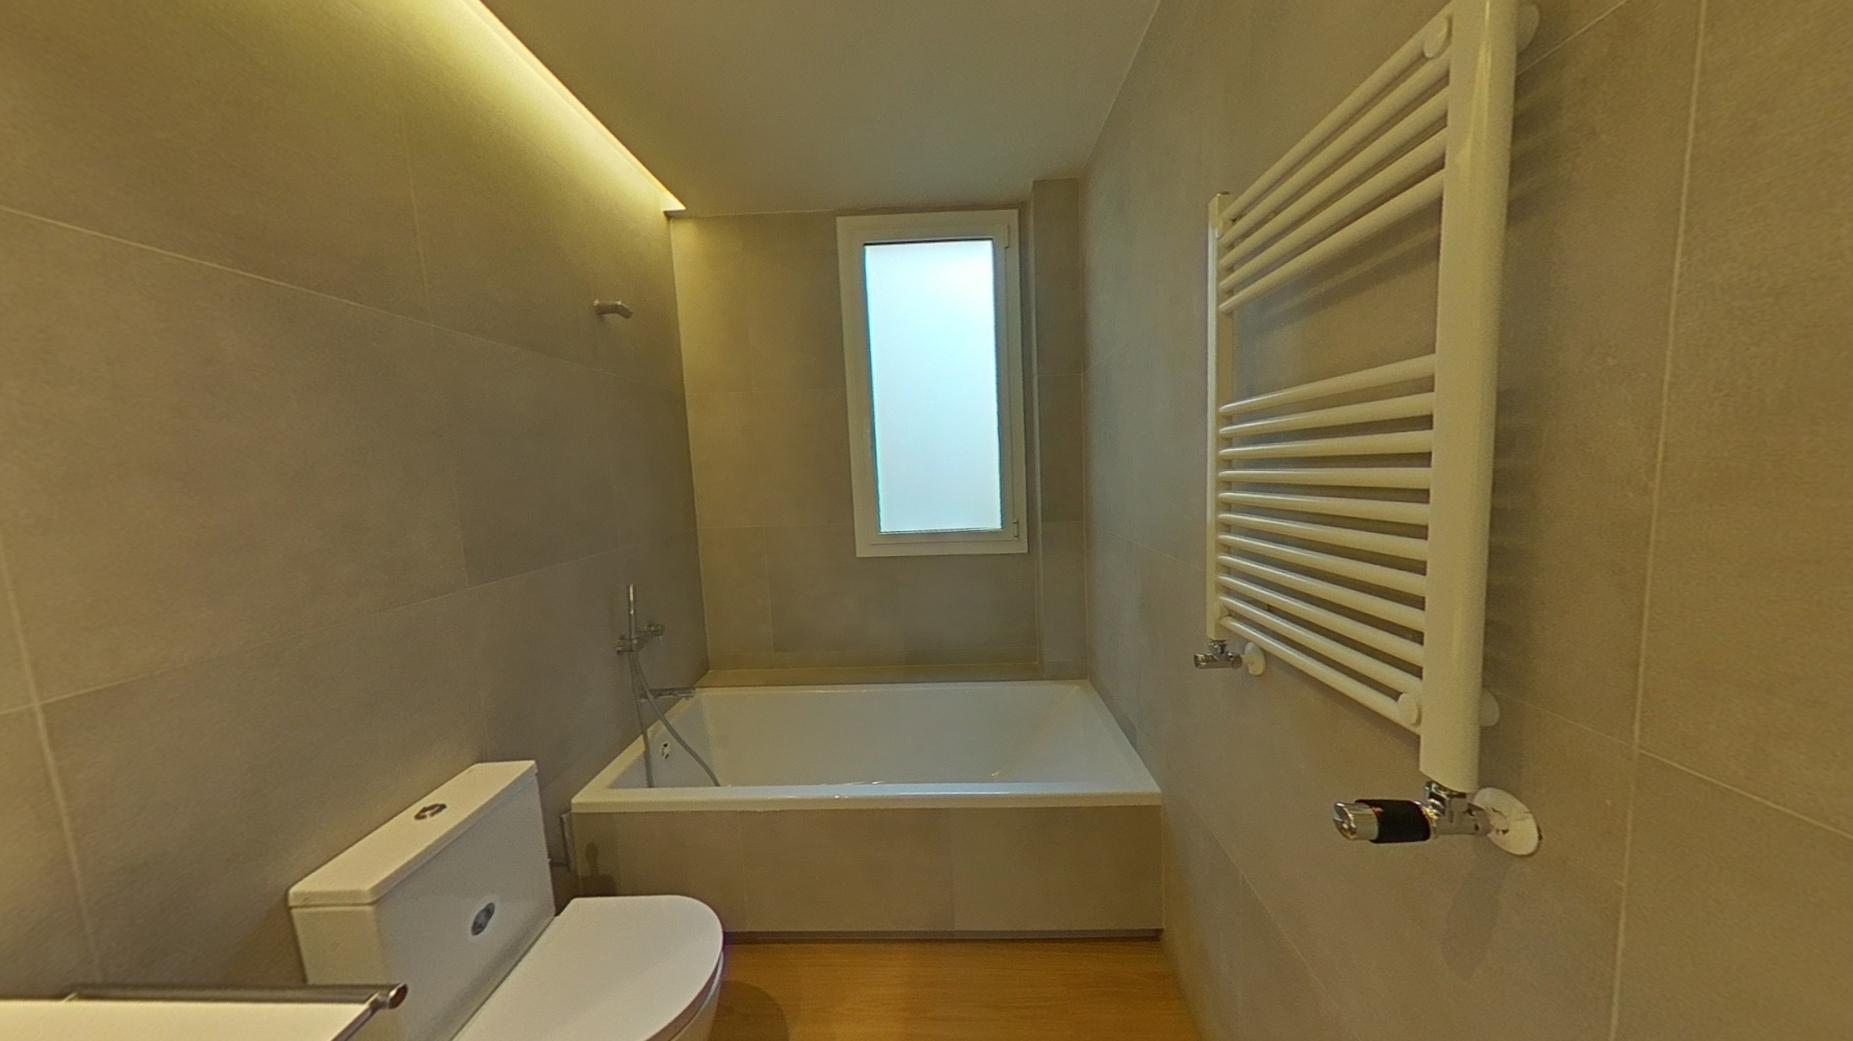 253492 Flat for sale in Sarrià-Sant Gervasi, Sant Gervasi-Galvany 38